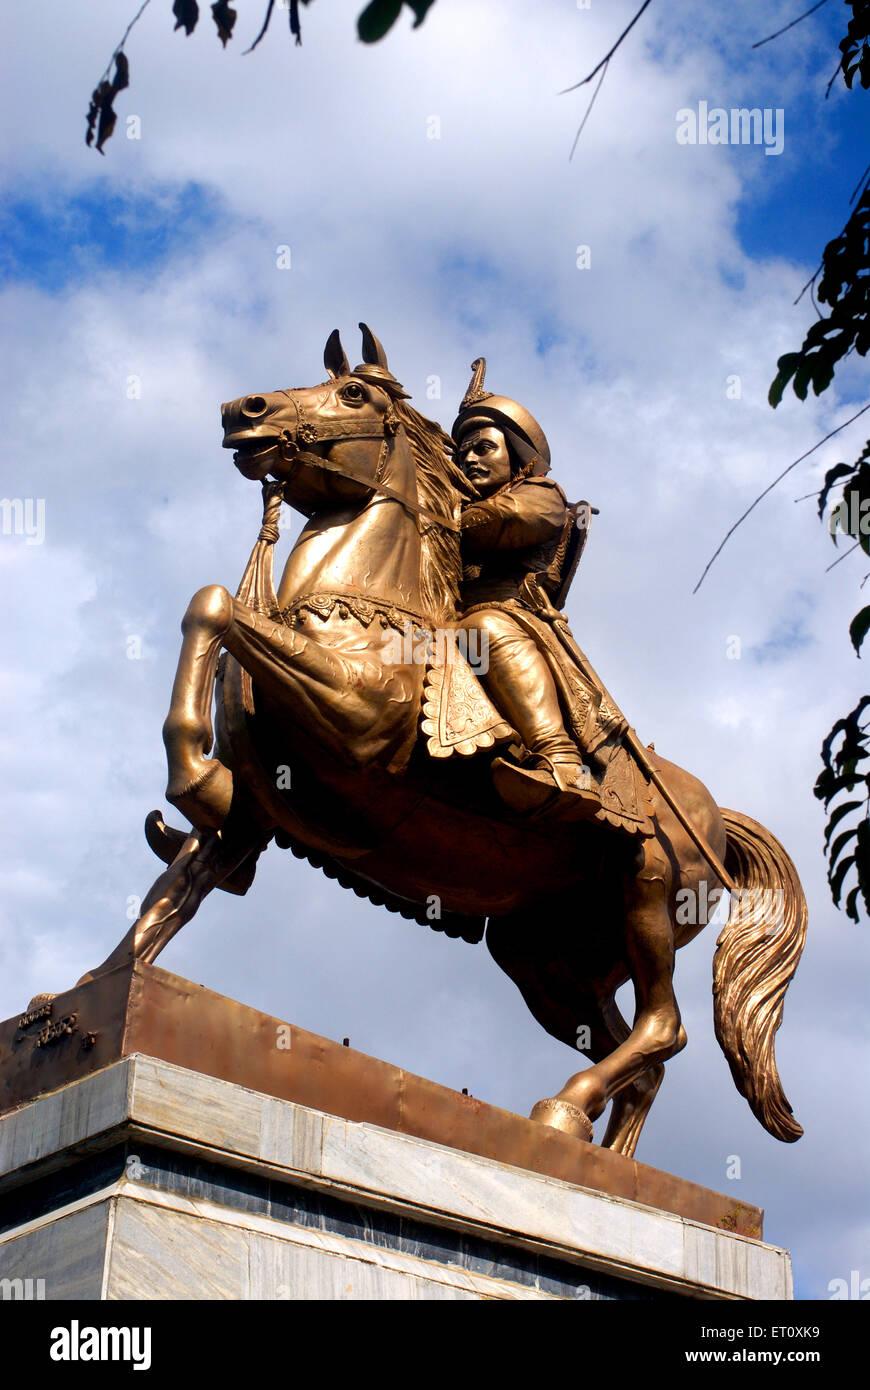 Reiterstatue von Thorale senior Bajirao Peshwa Bronze Metall Maratha; Pune; Maharashtra; Indien Stockfoto